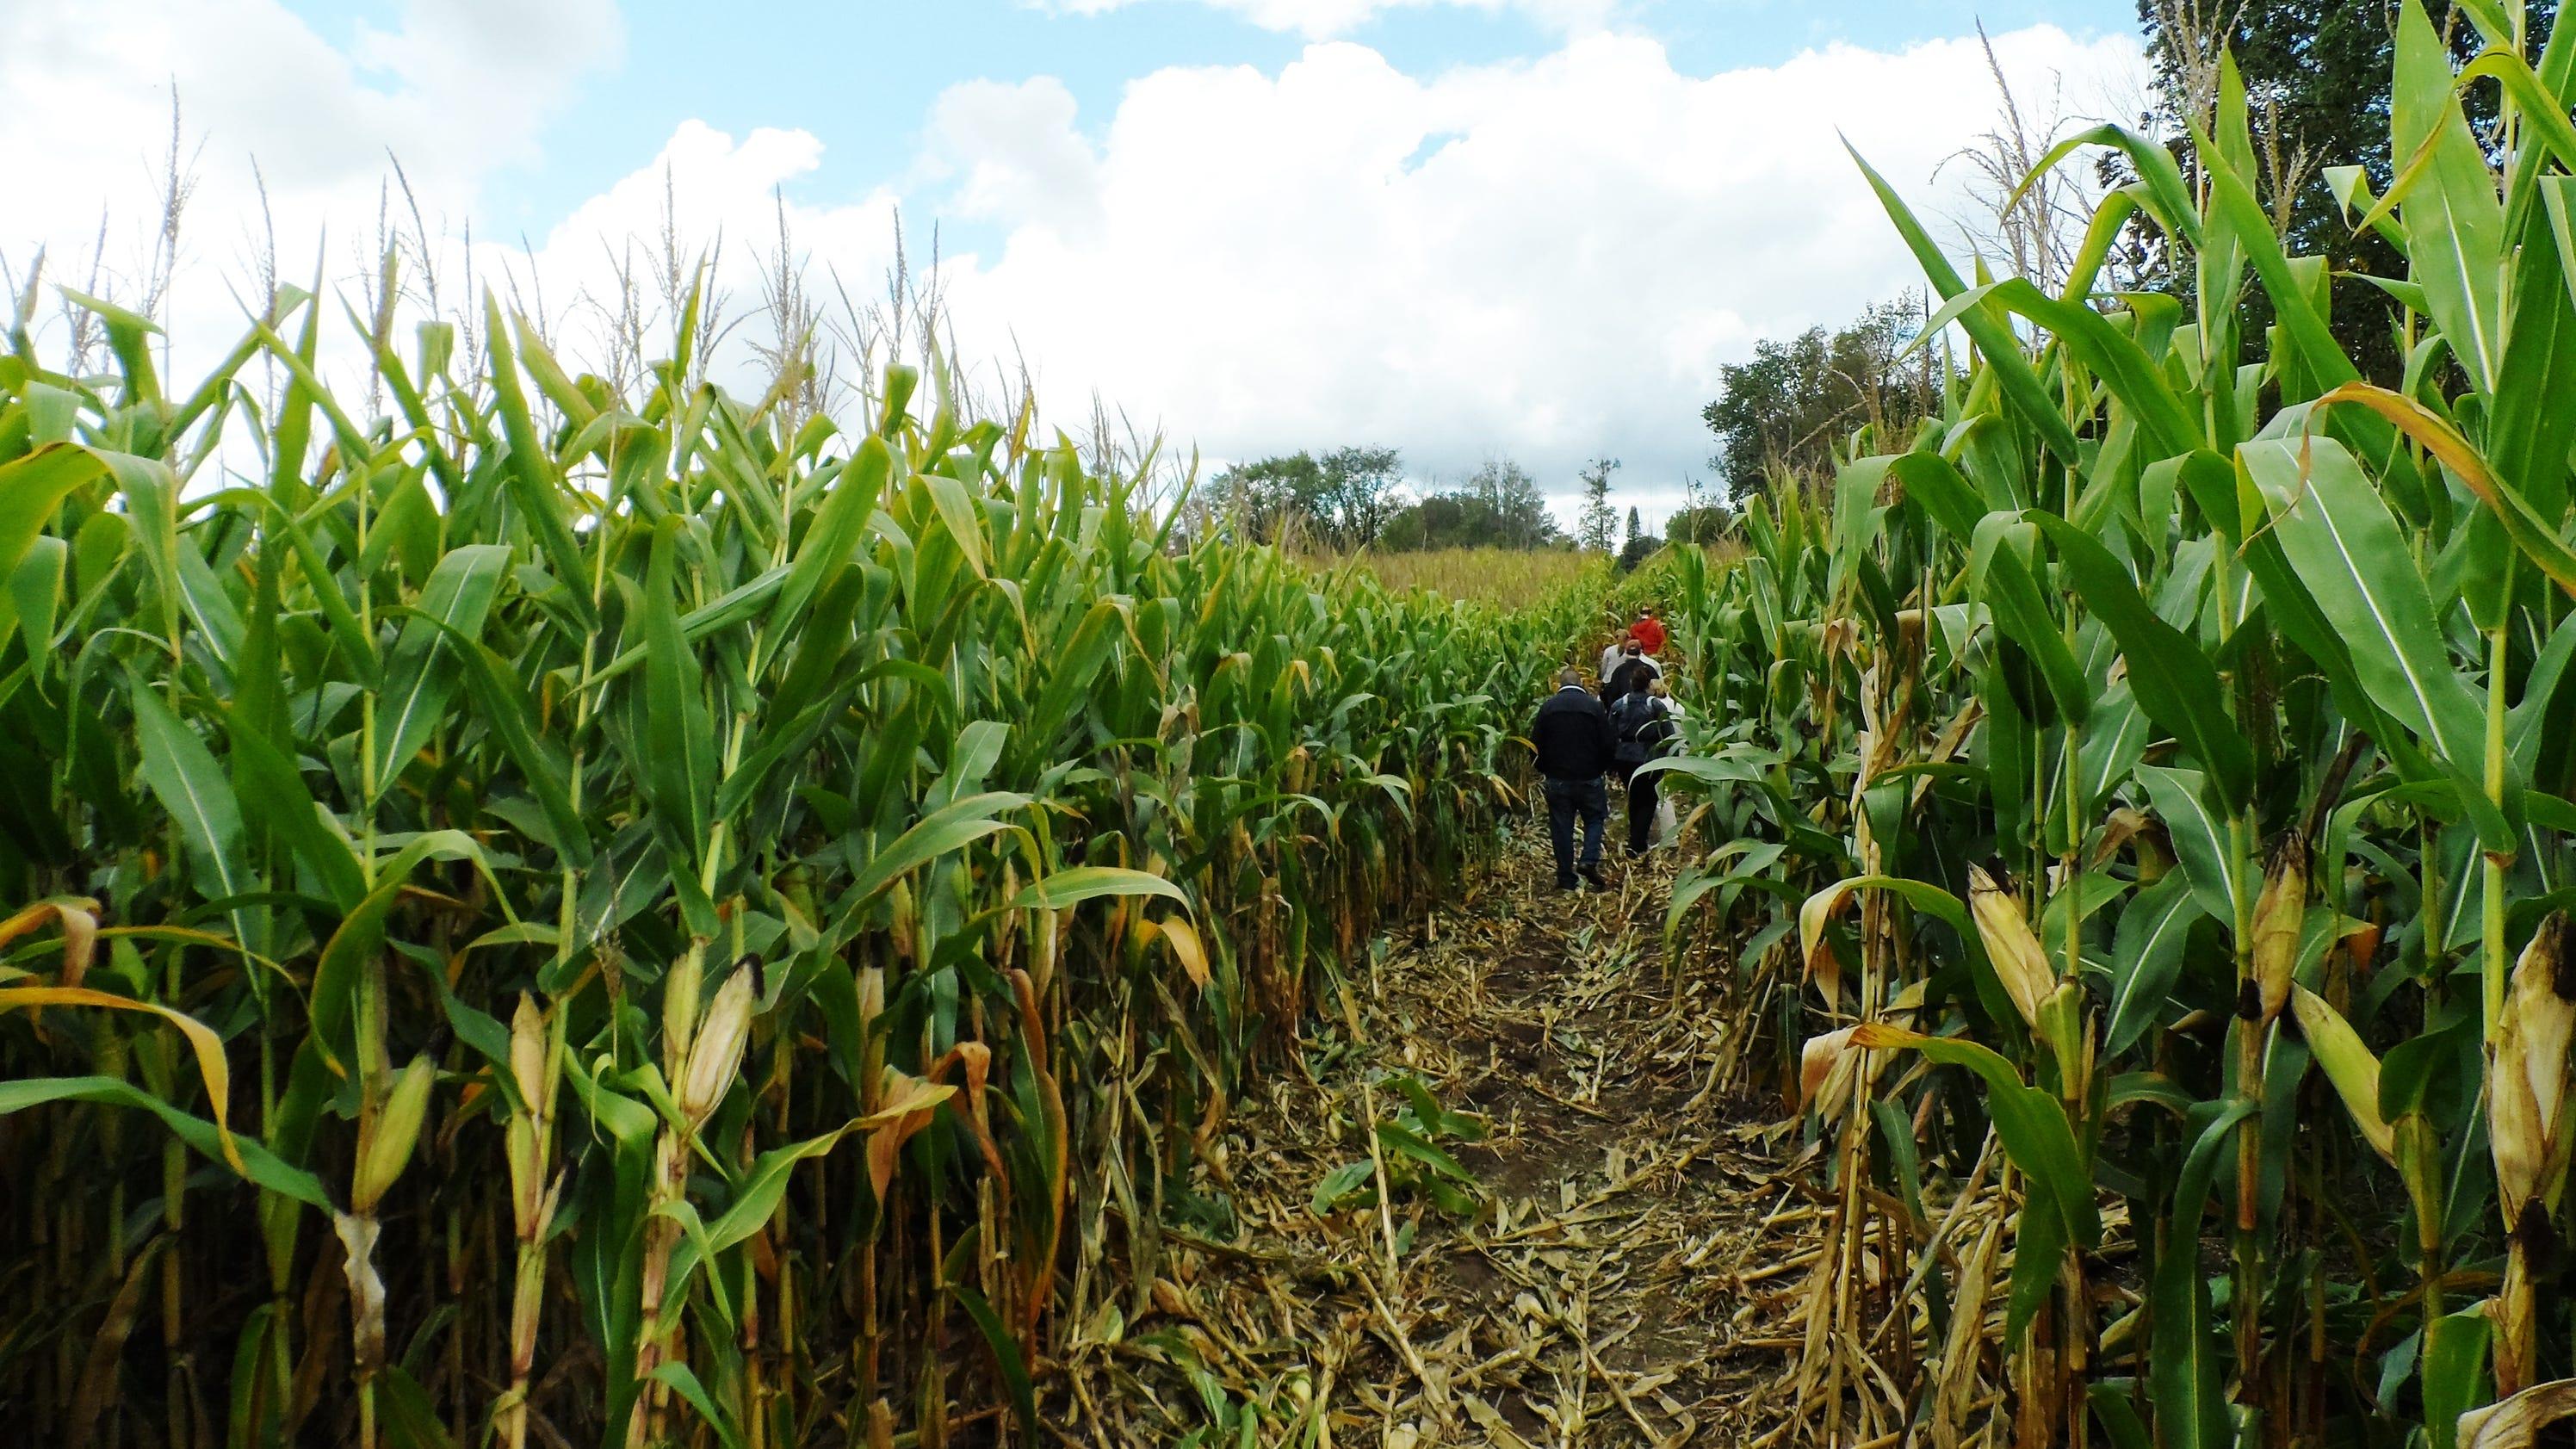 Maybury Corn Maze is challenge